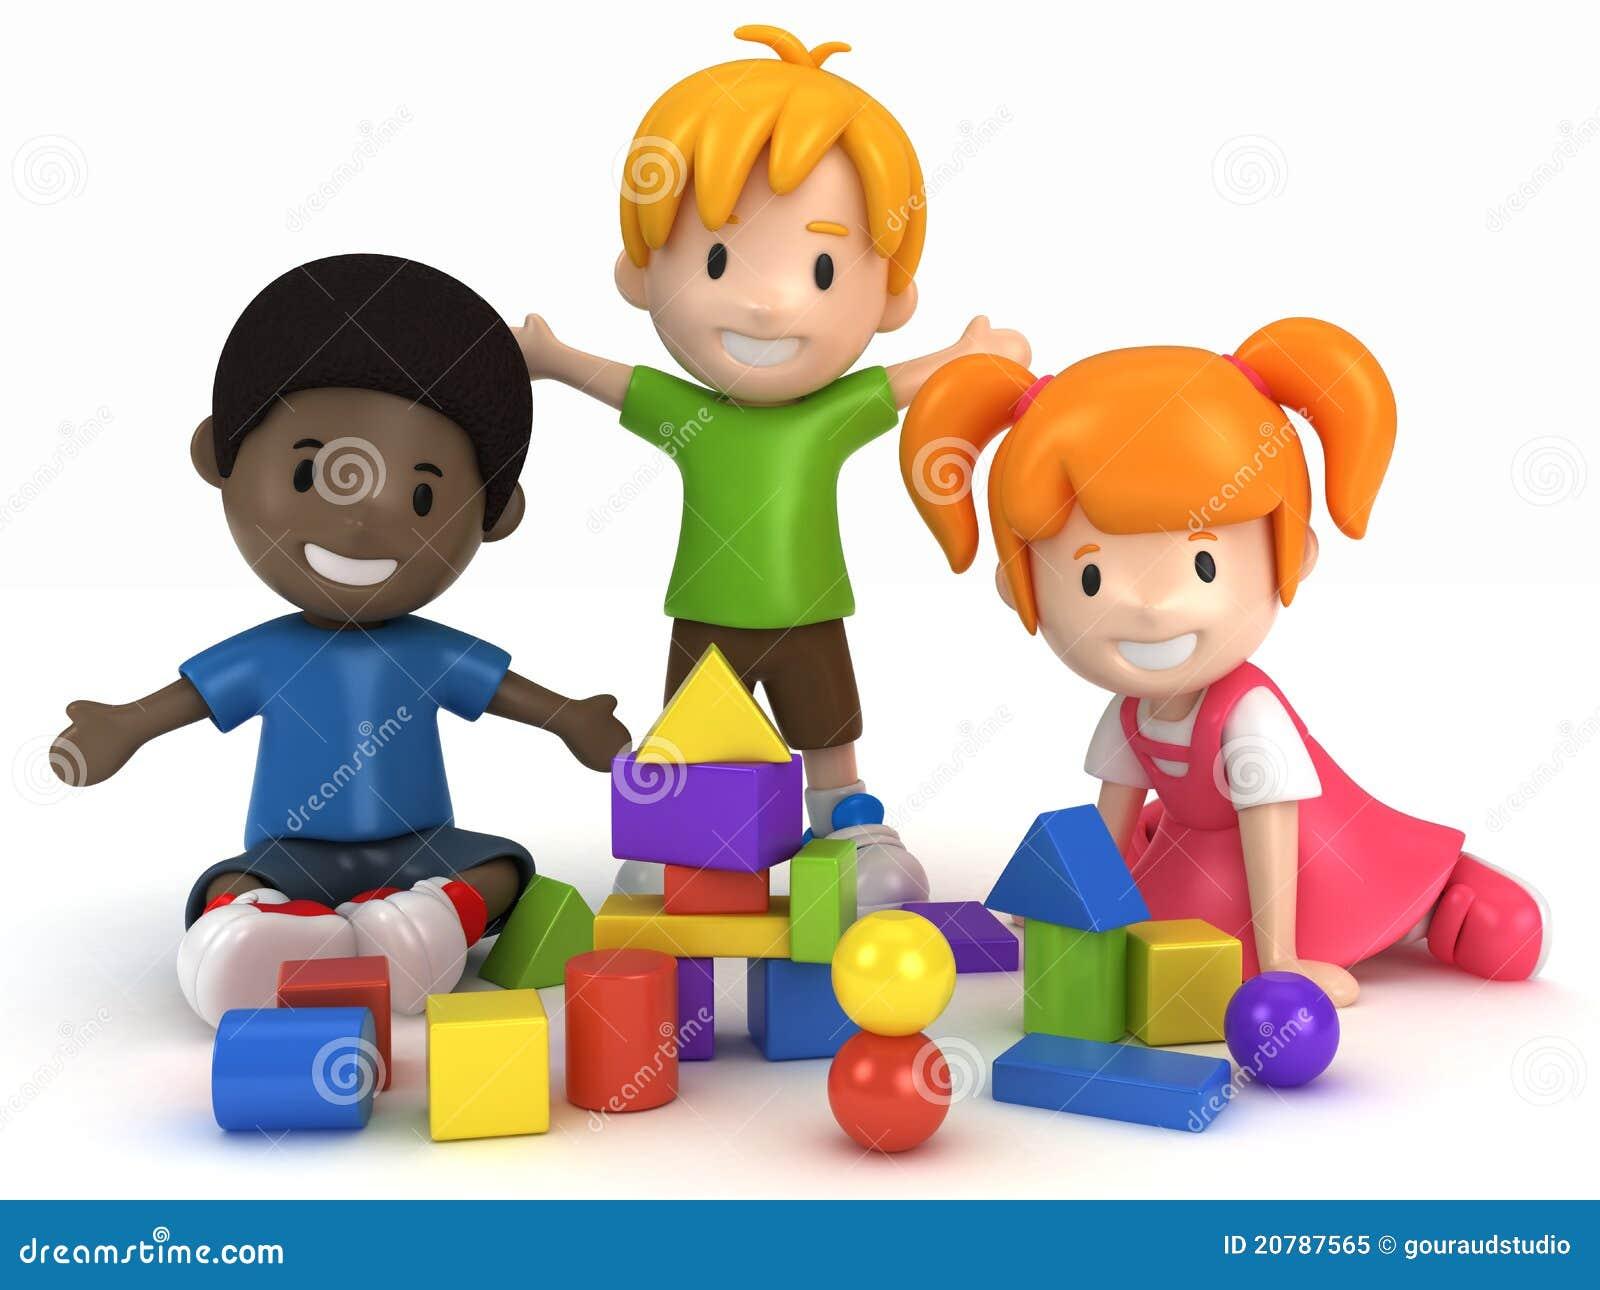 Kids Playing Building Blocks Royalty Free Stock Photo